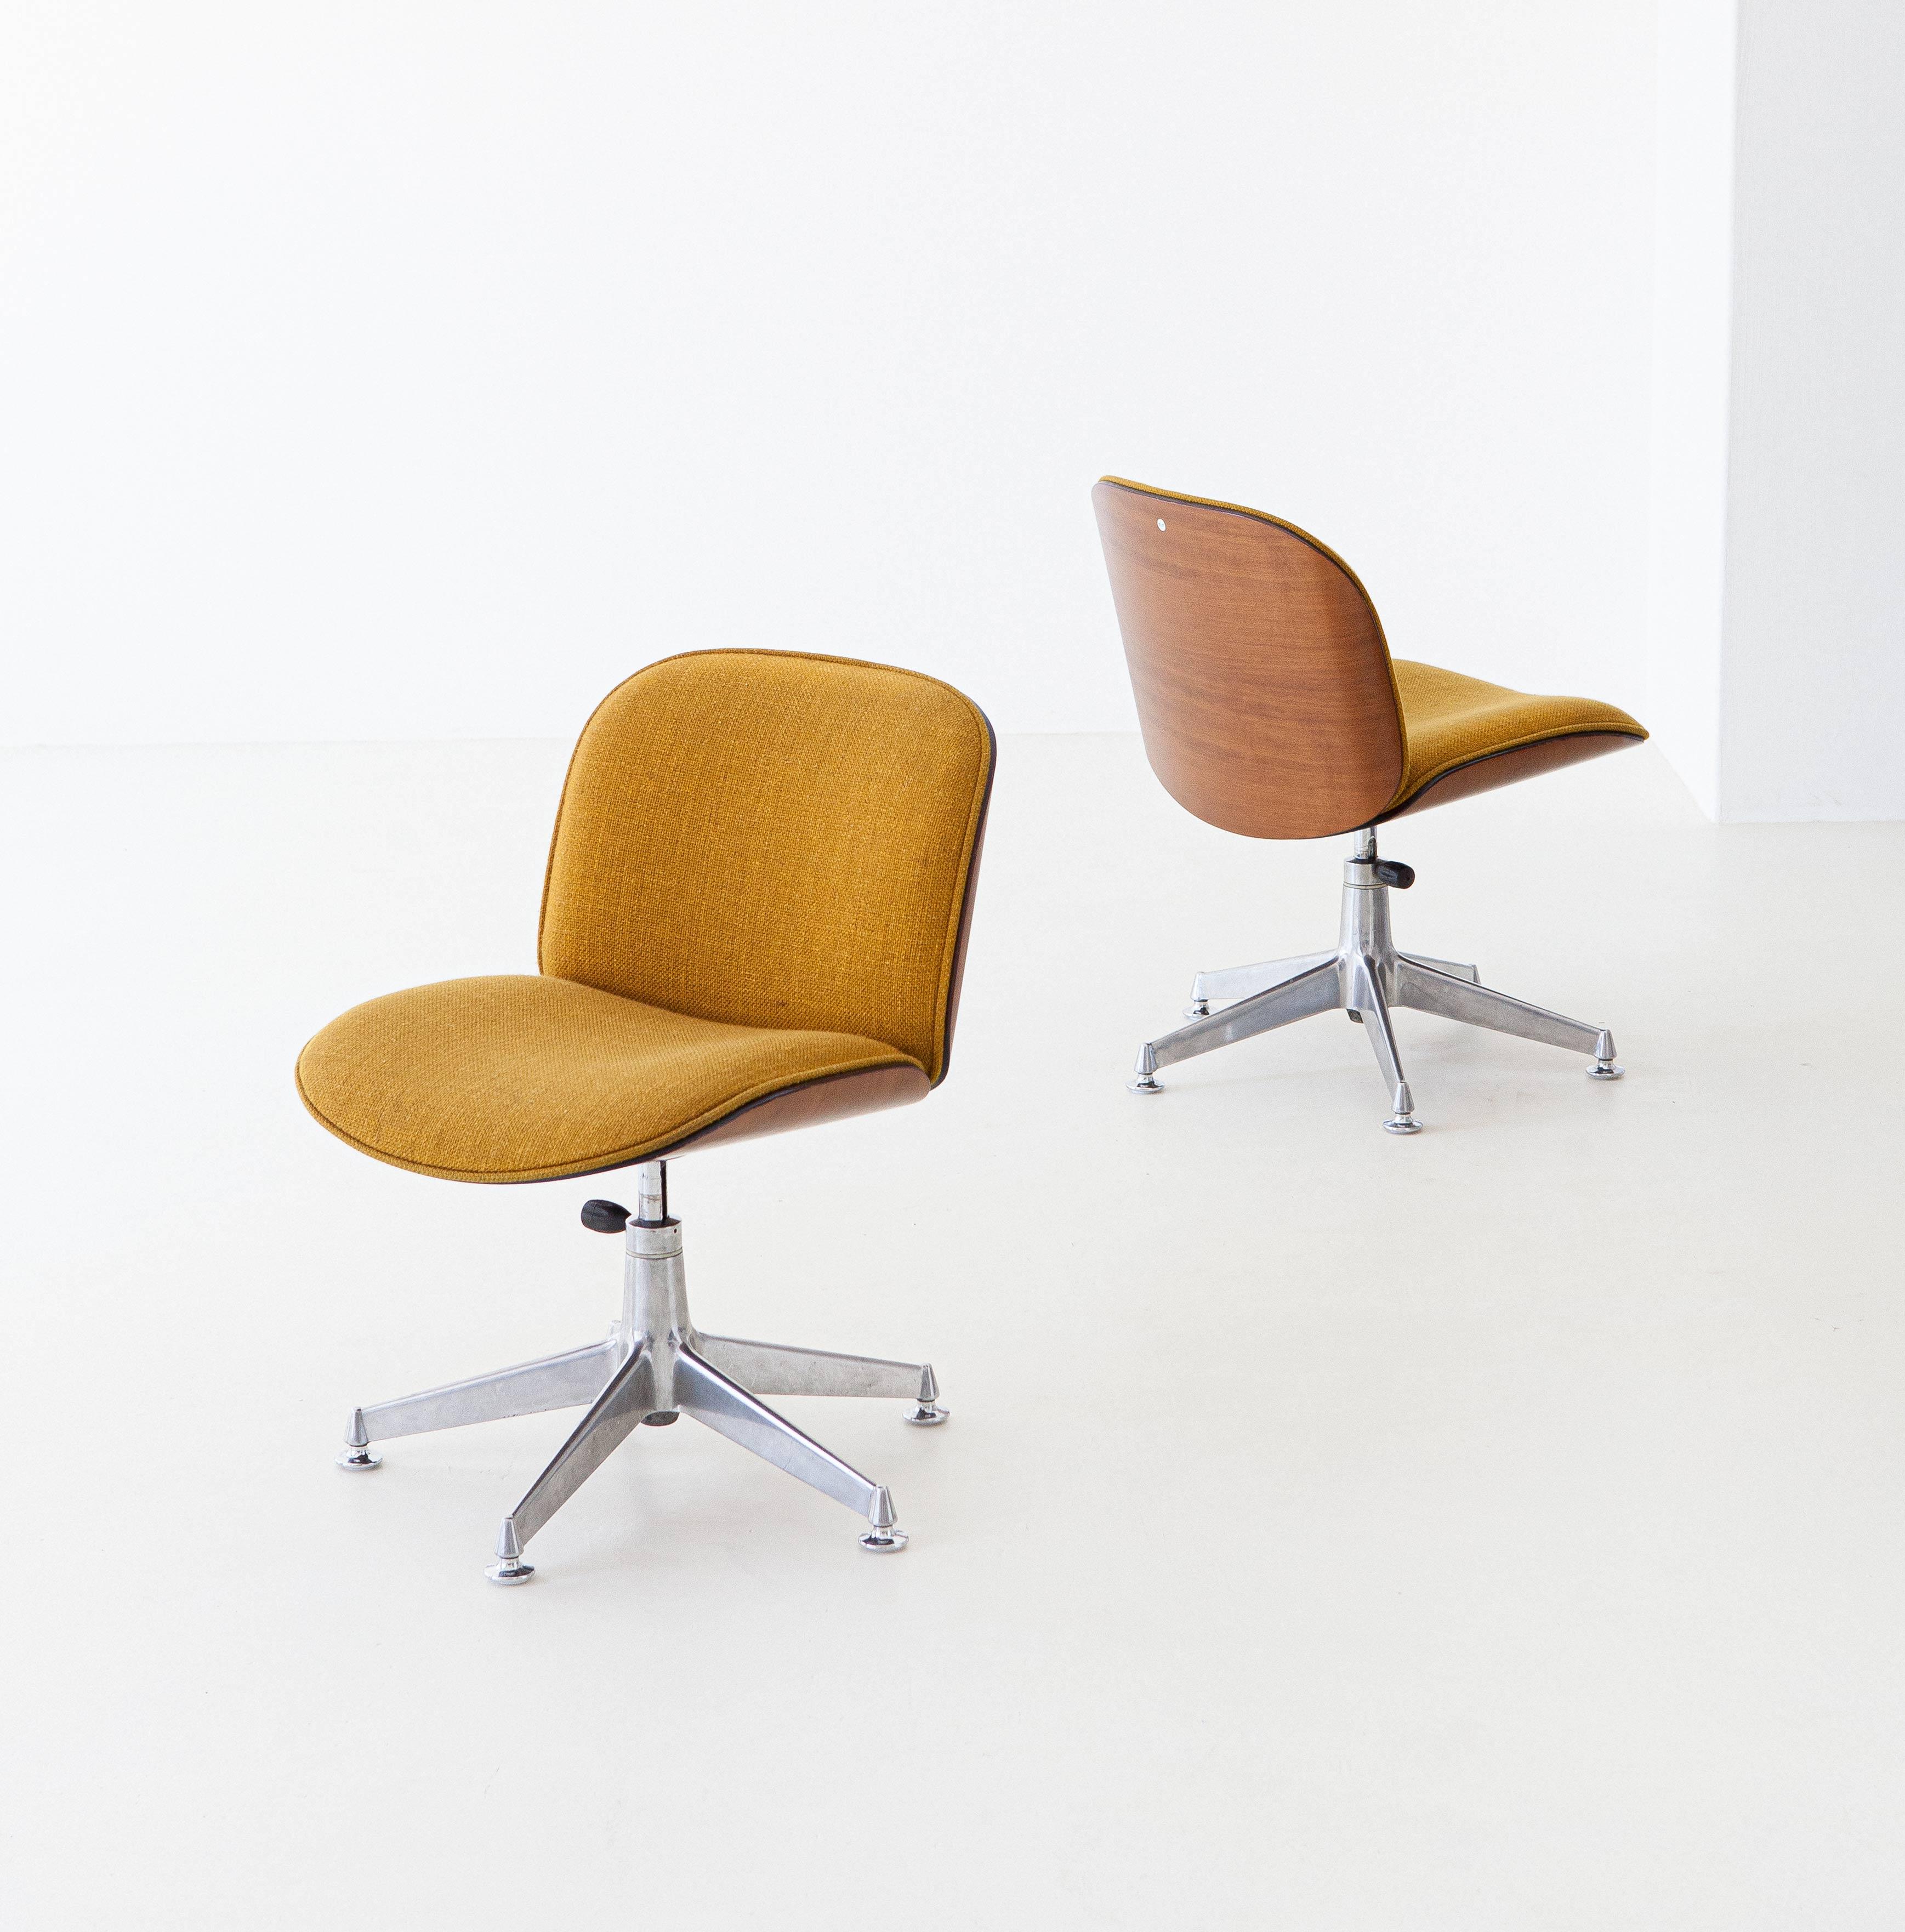 1950s-ico-parisi-for-mim-walnut-swivel-desk-chairs-4-se305